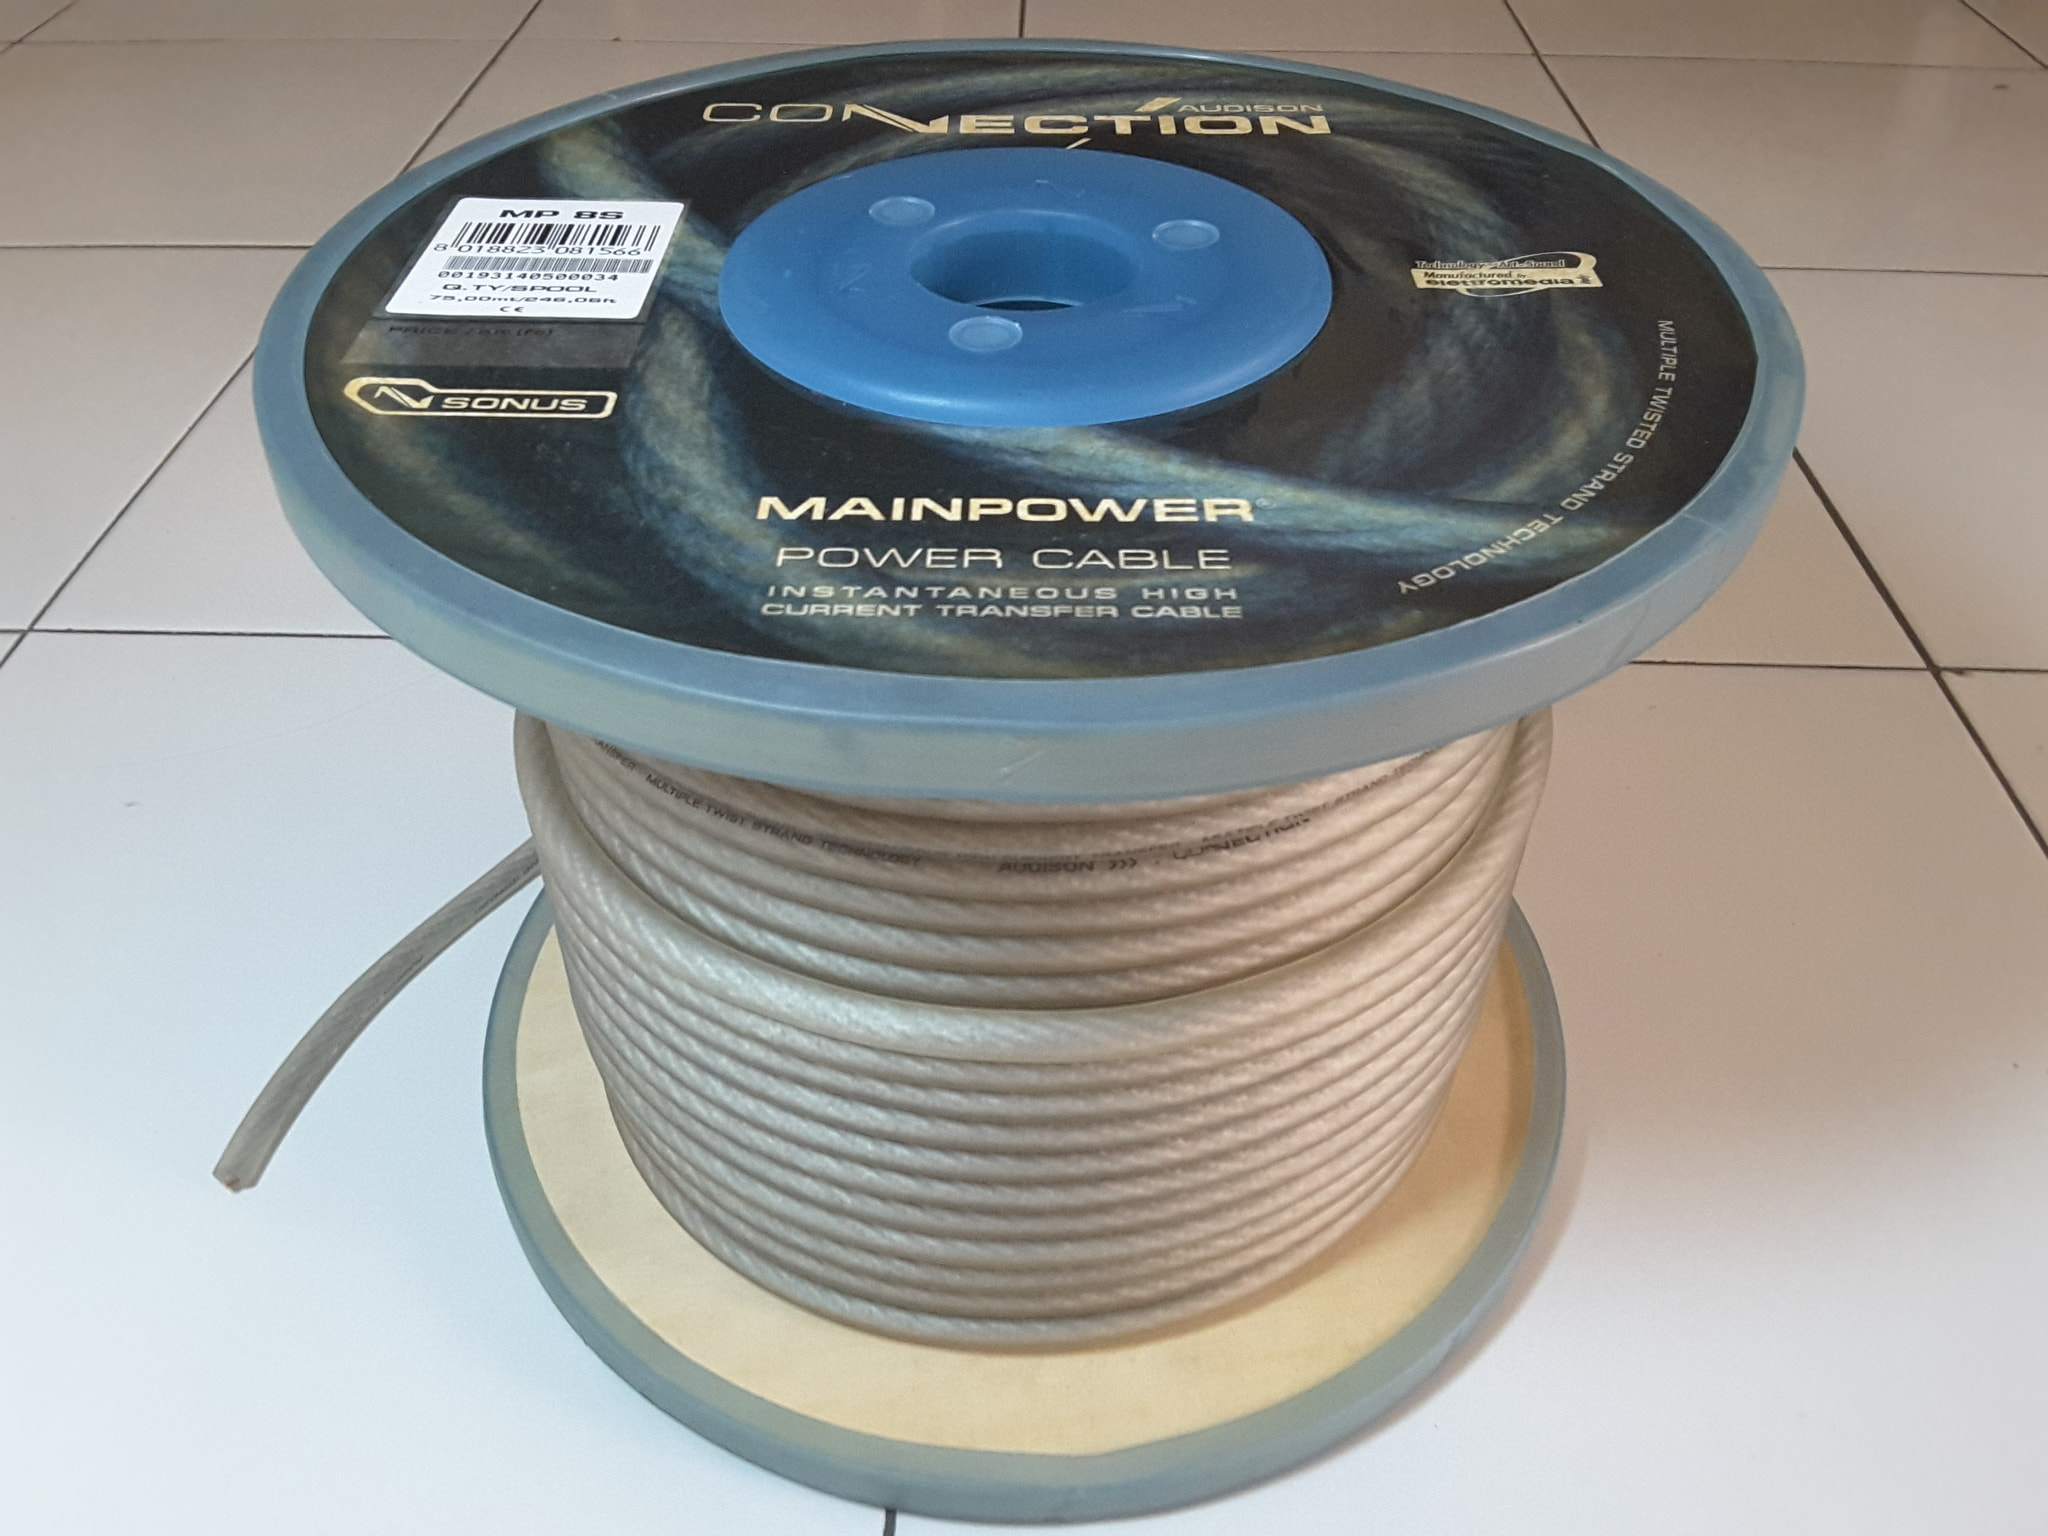 Berühmt Bester Lautsprecherkabel 12 Awg Galerie - Elektrische ...